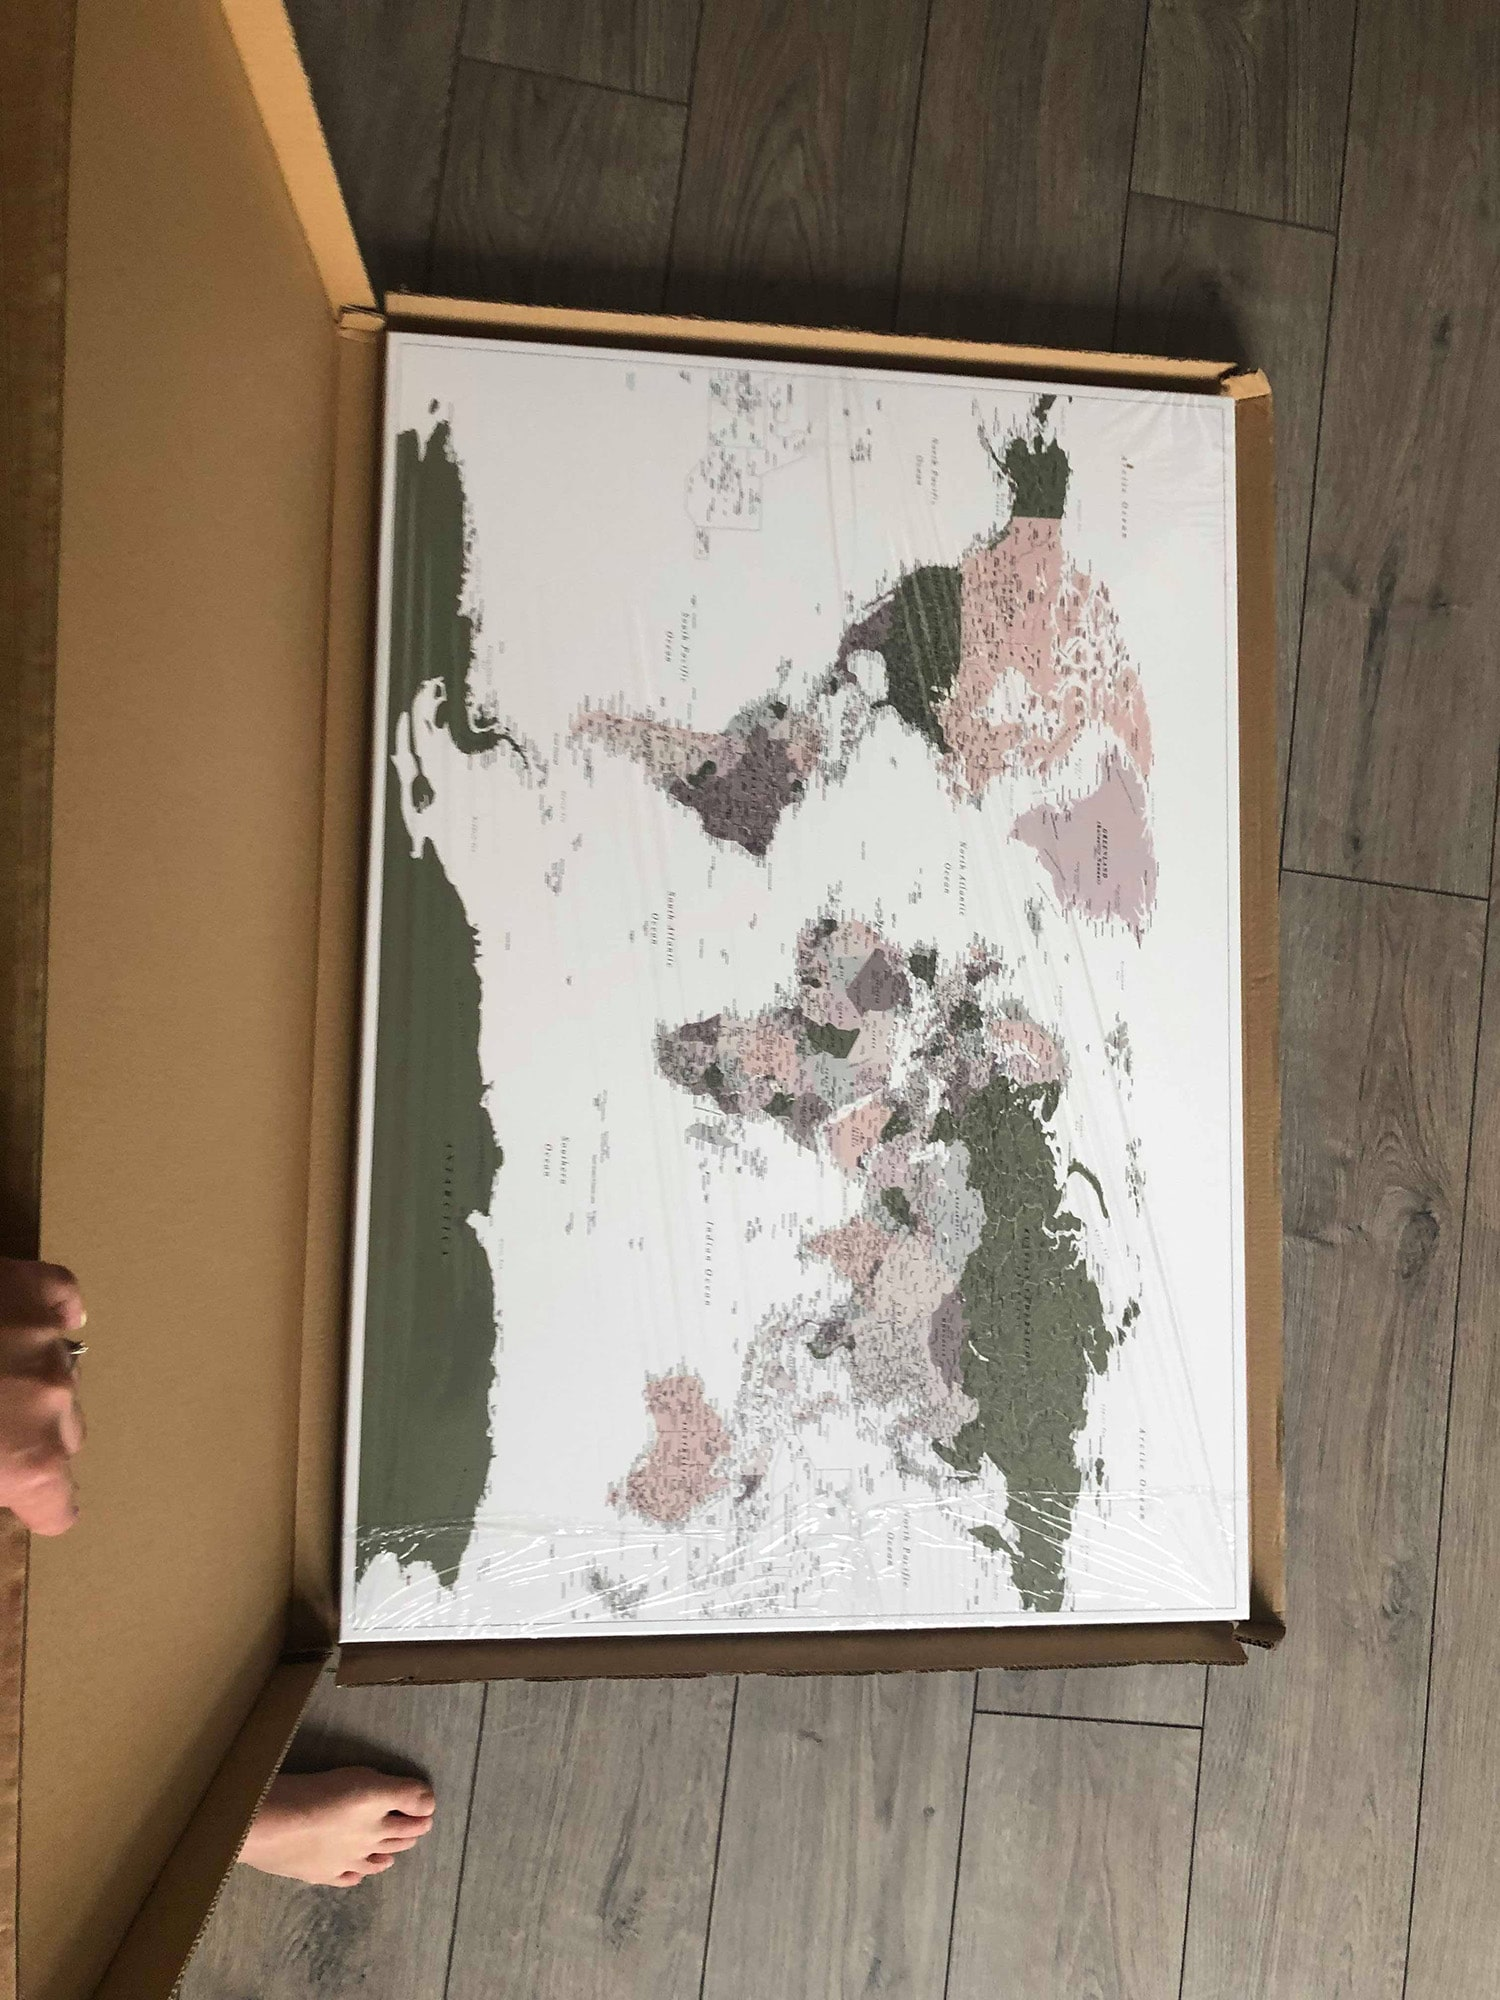 Detailliert karte pinnwand tripmapworld